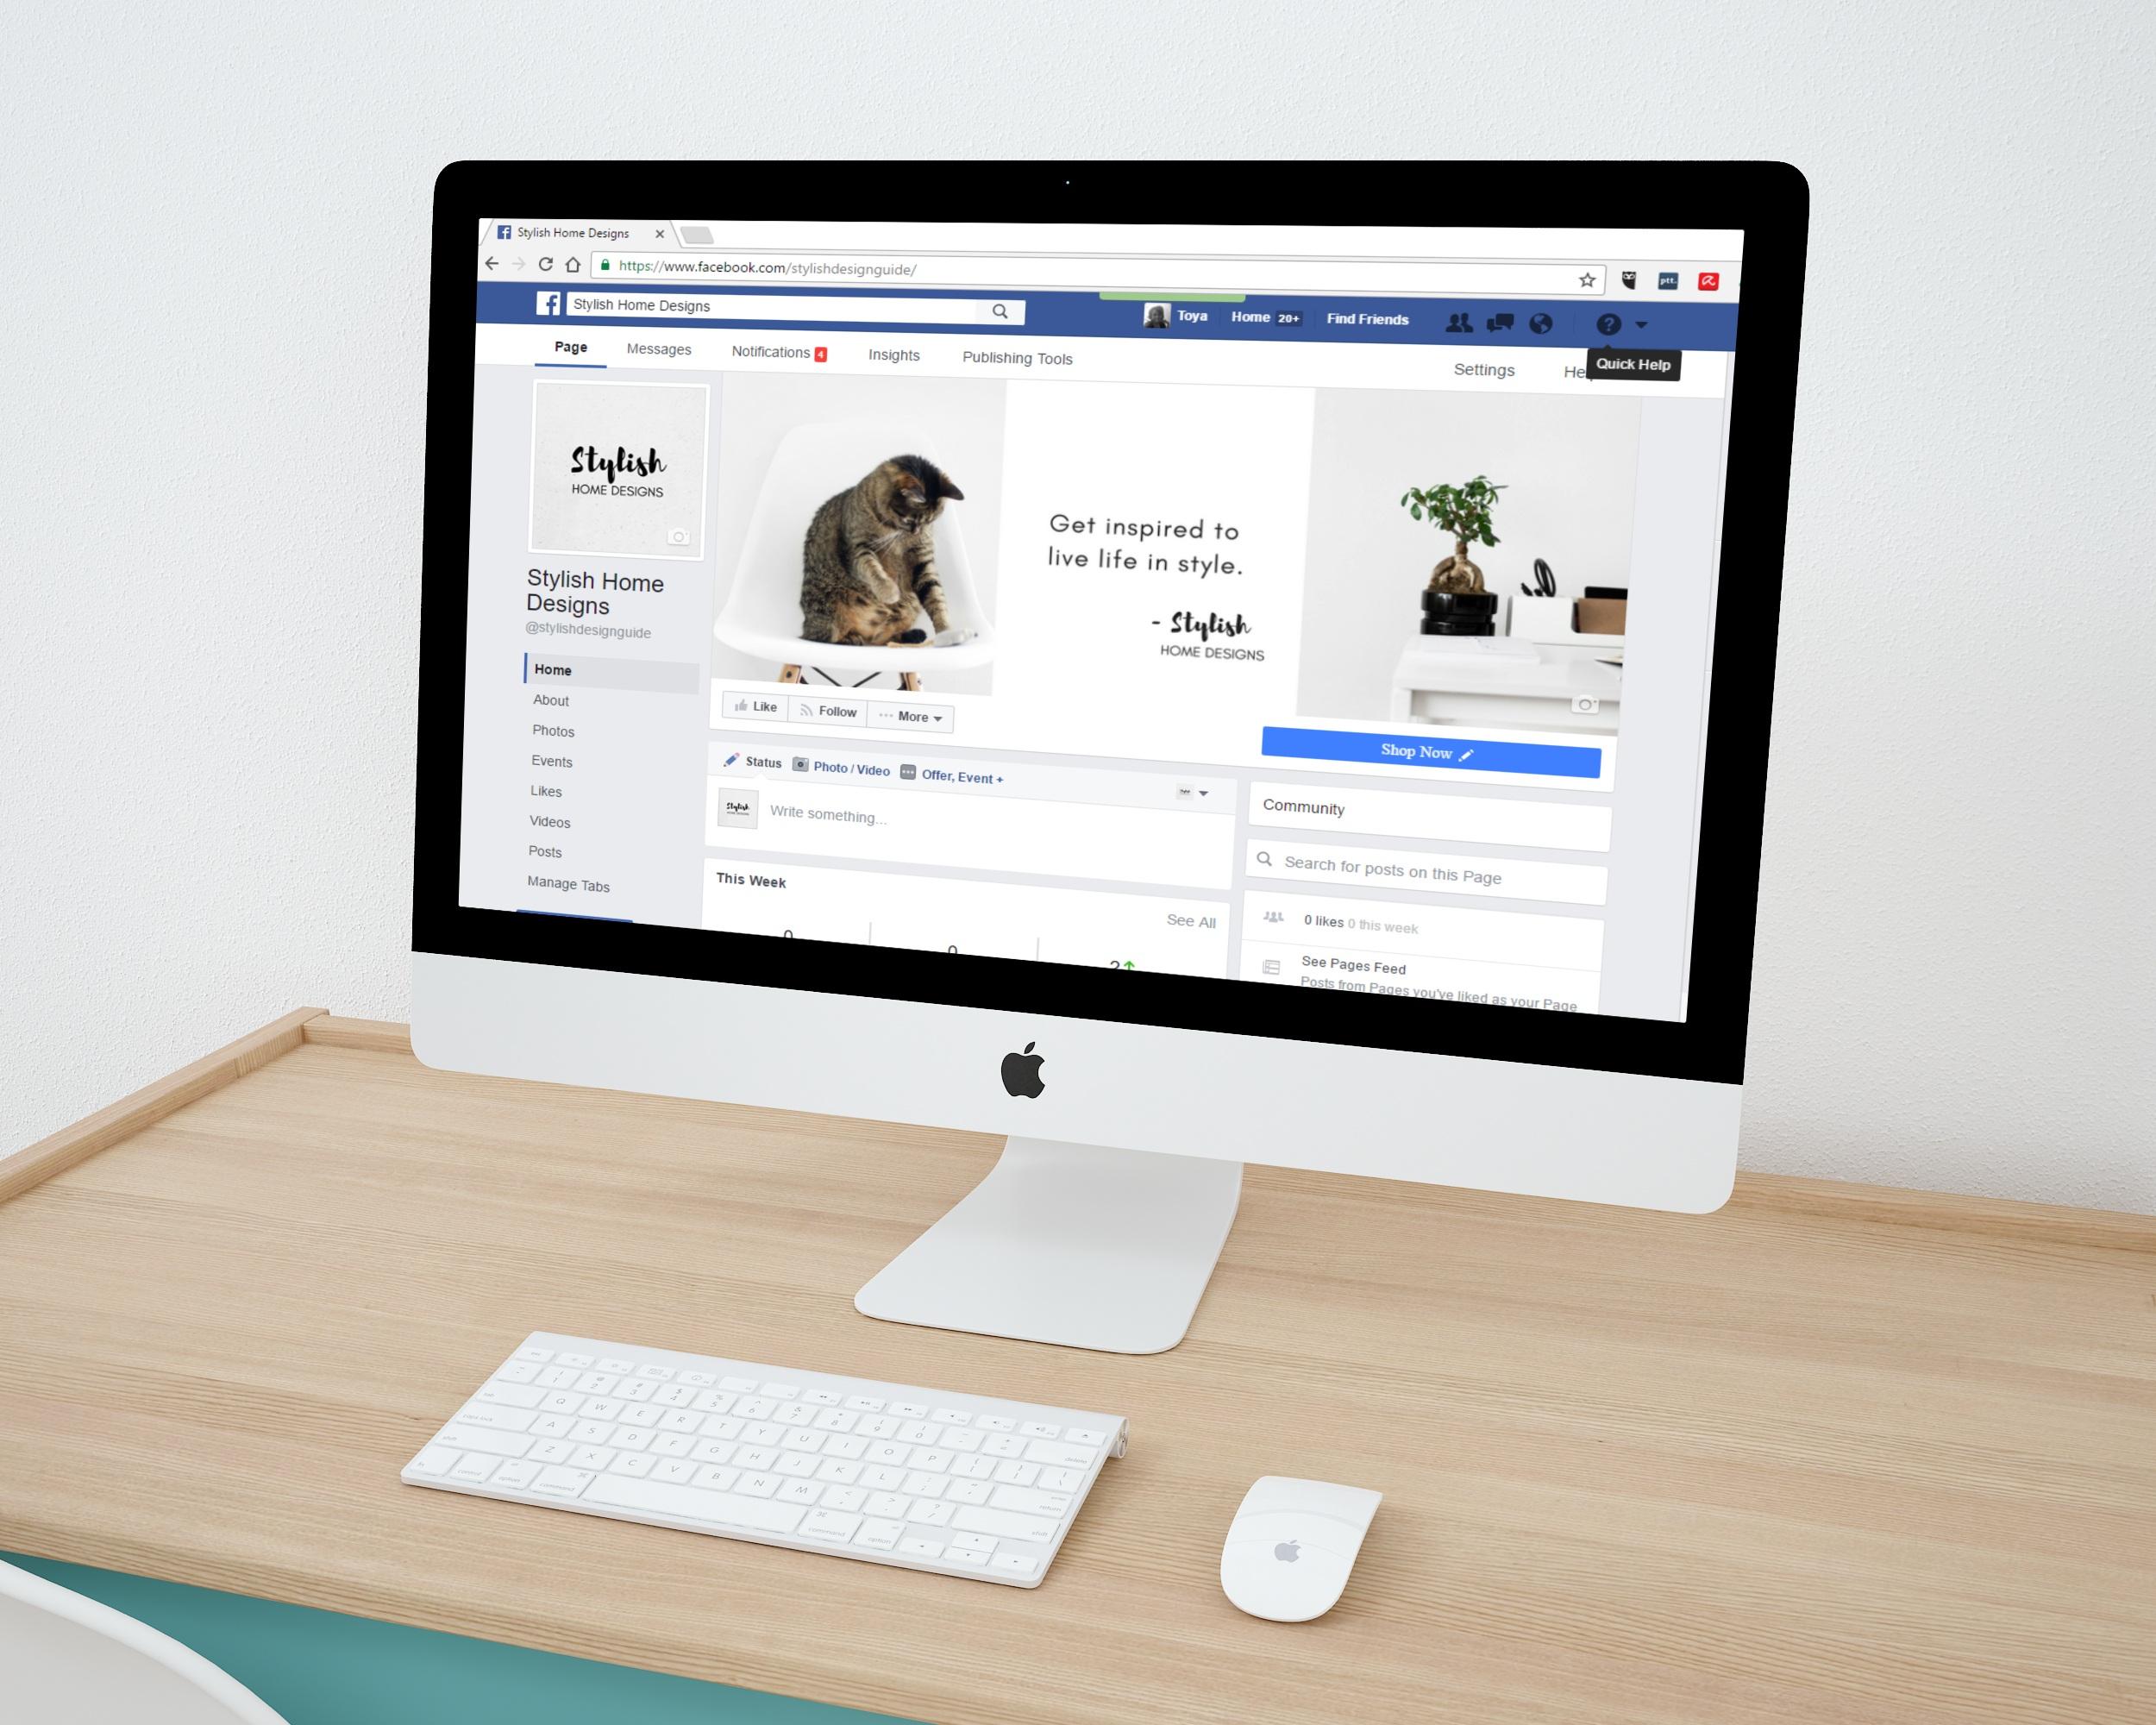 Multimedia Presentation Screenshot Online Royalty Free Mockup Small Business Social Networking Network Digital Marketing Home Design